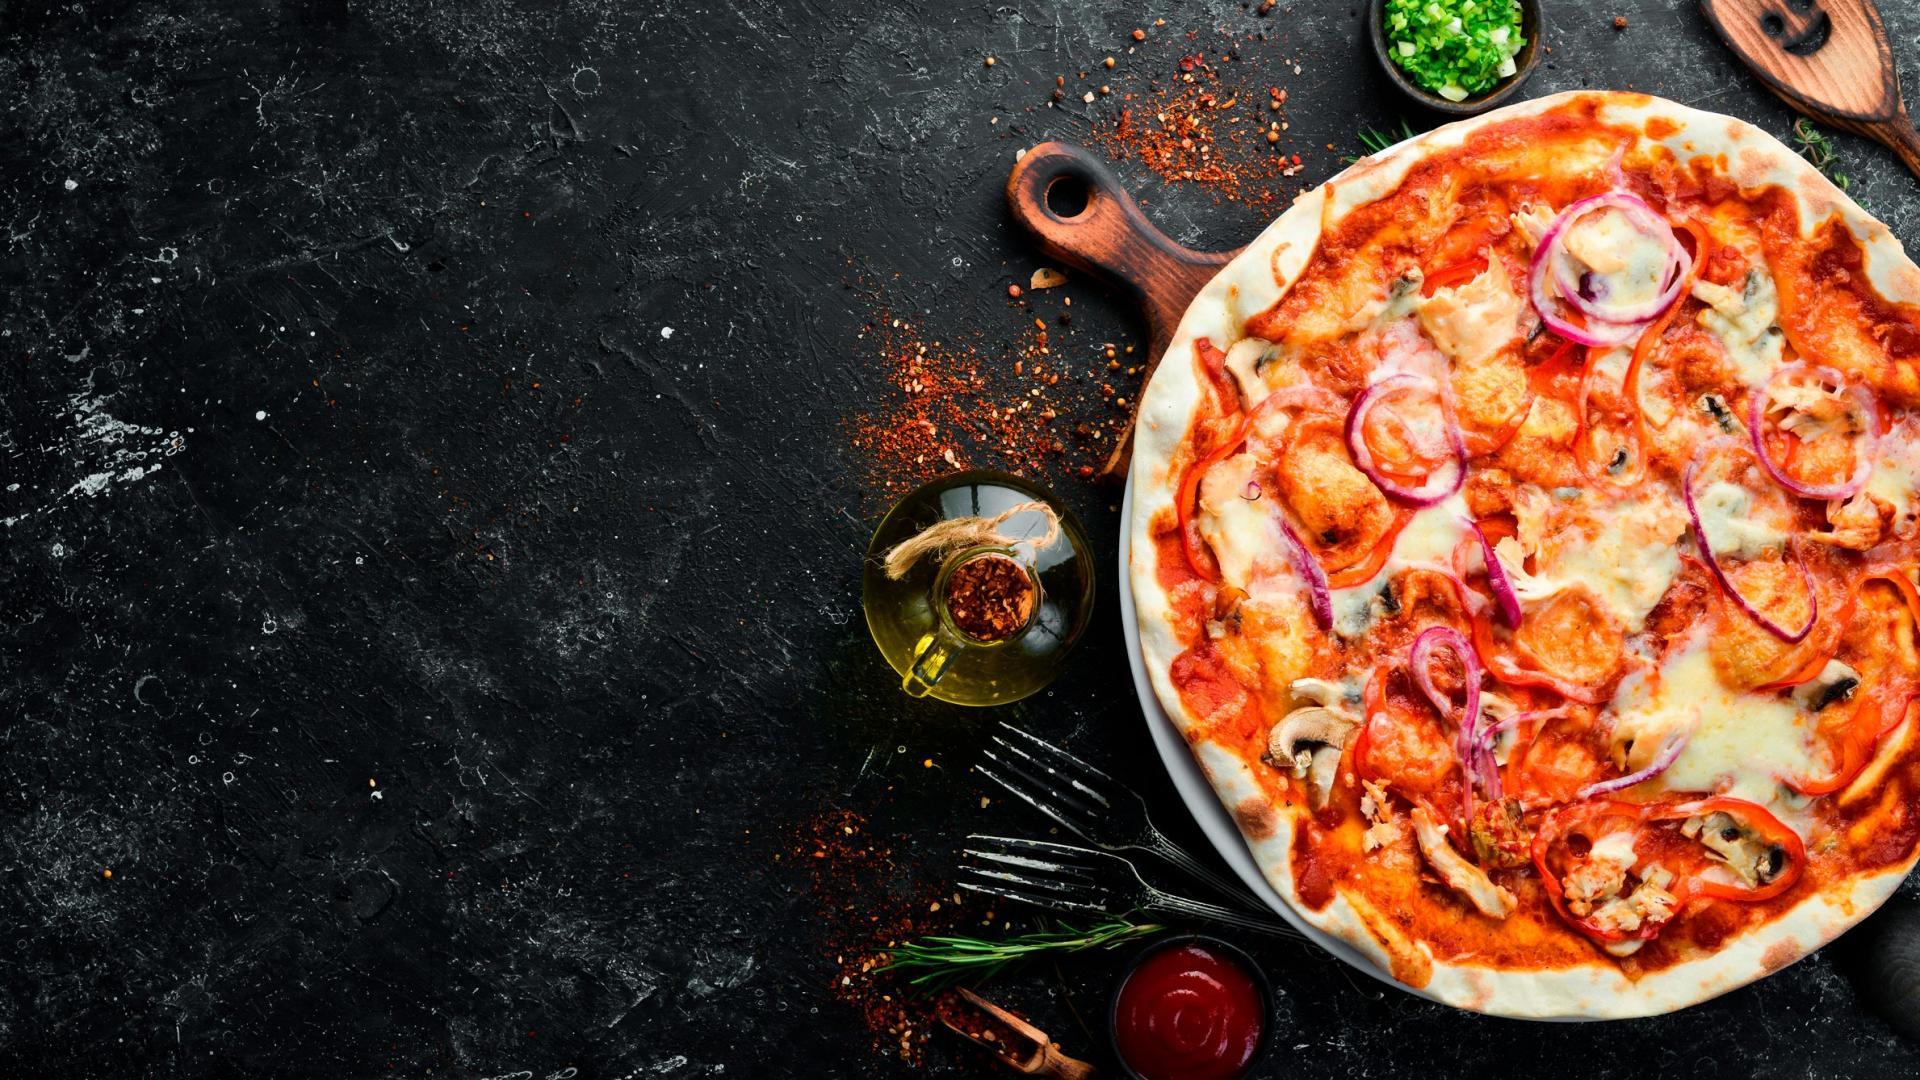 Ristaurante Pizzeria Roma Italienische Klassiker